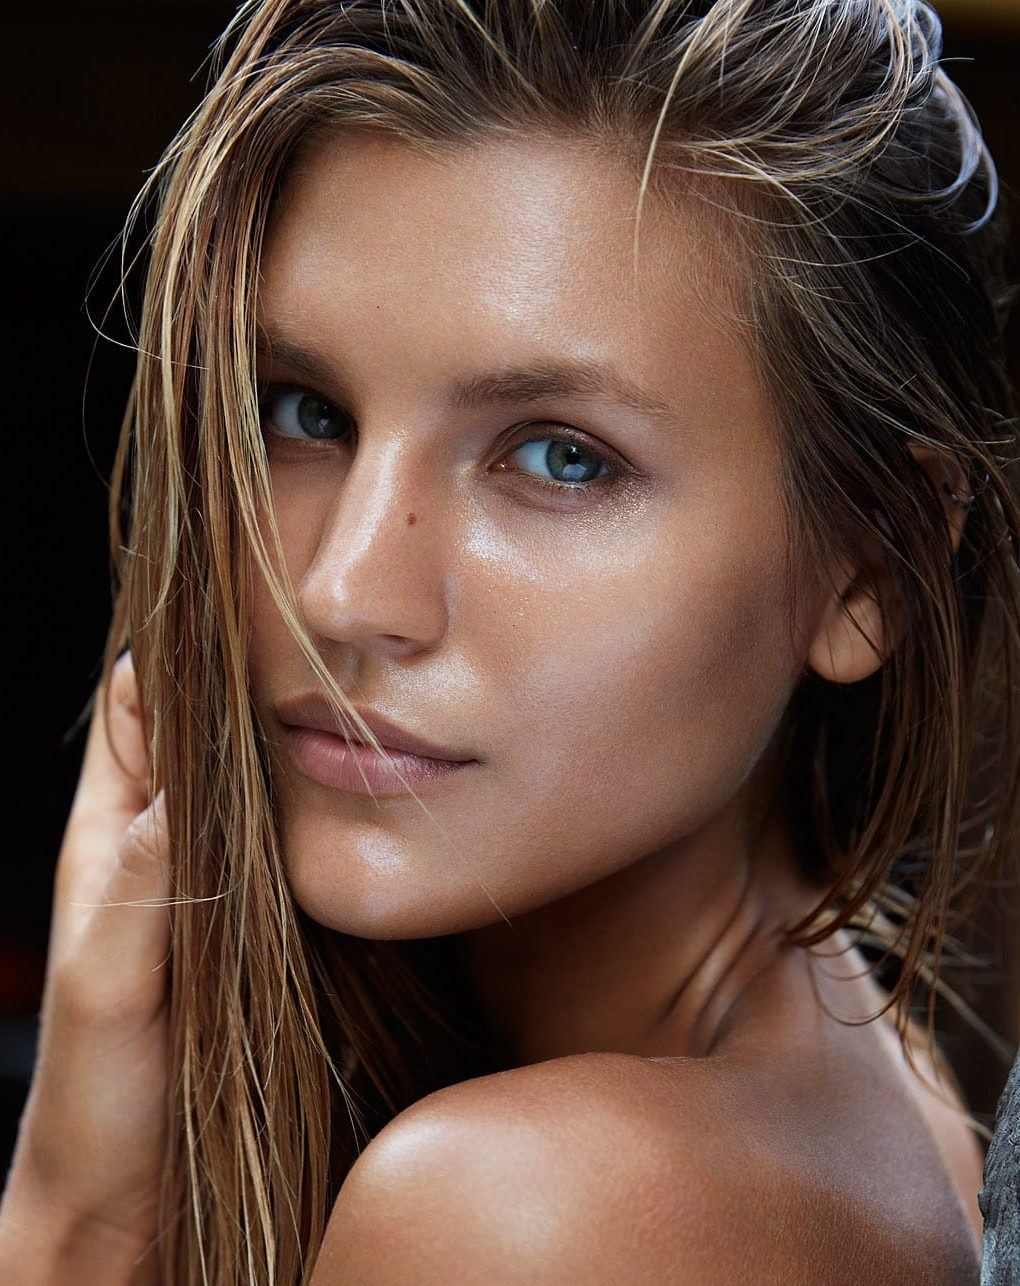 Balistarz-model-Anastasia-Bluemoloko-head-close-up-portrait-sharp-in-color-beauty-look-at-camera